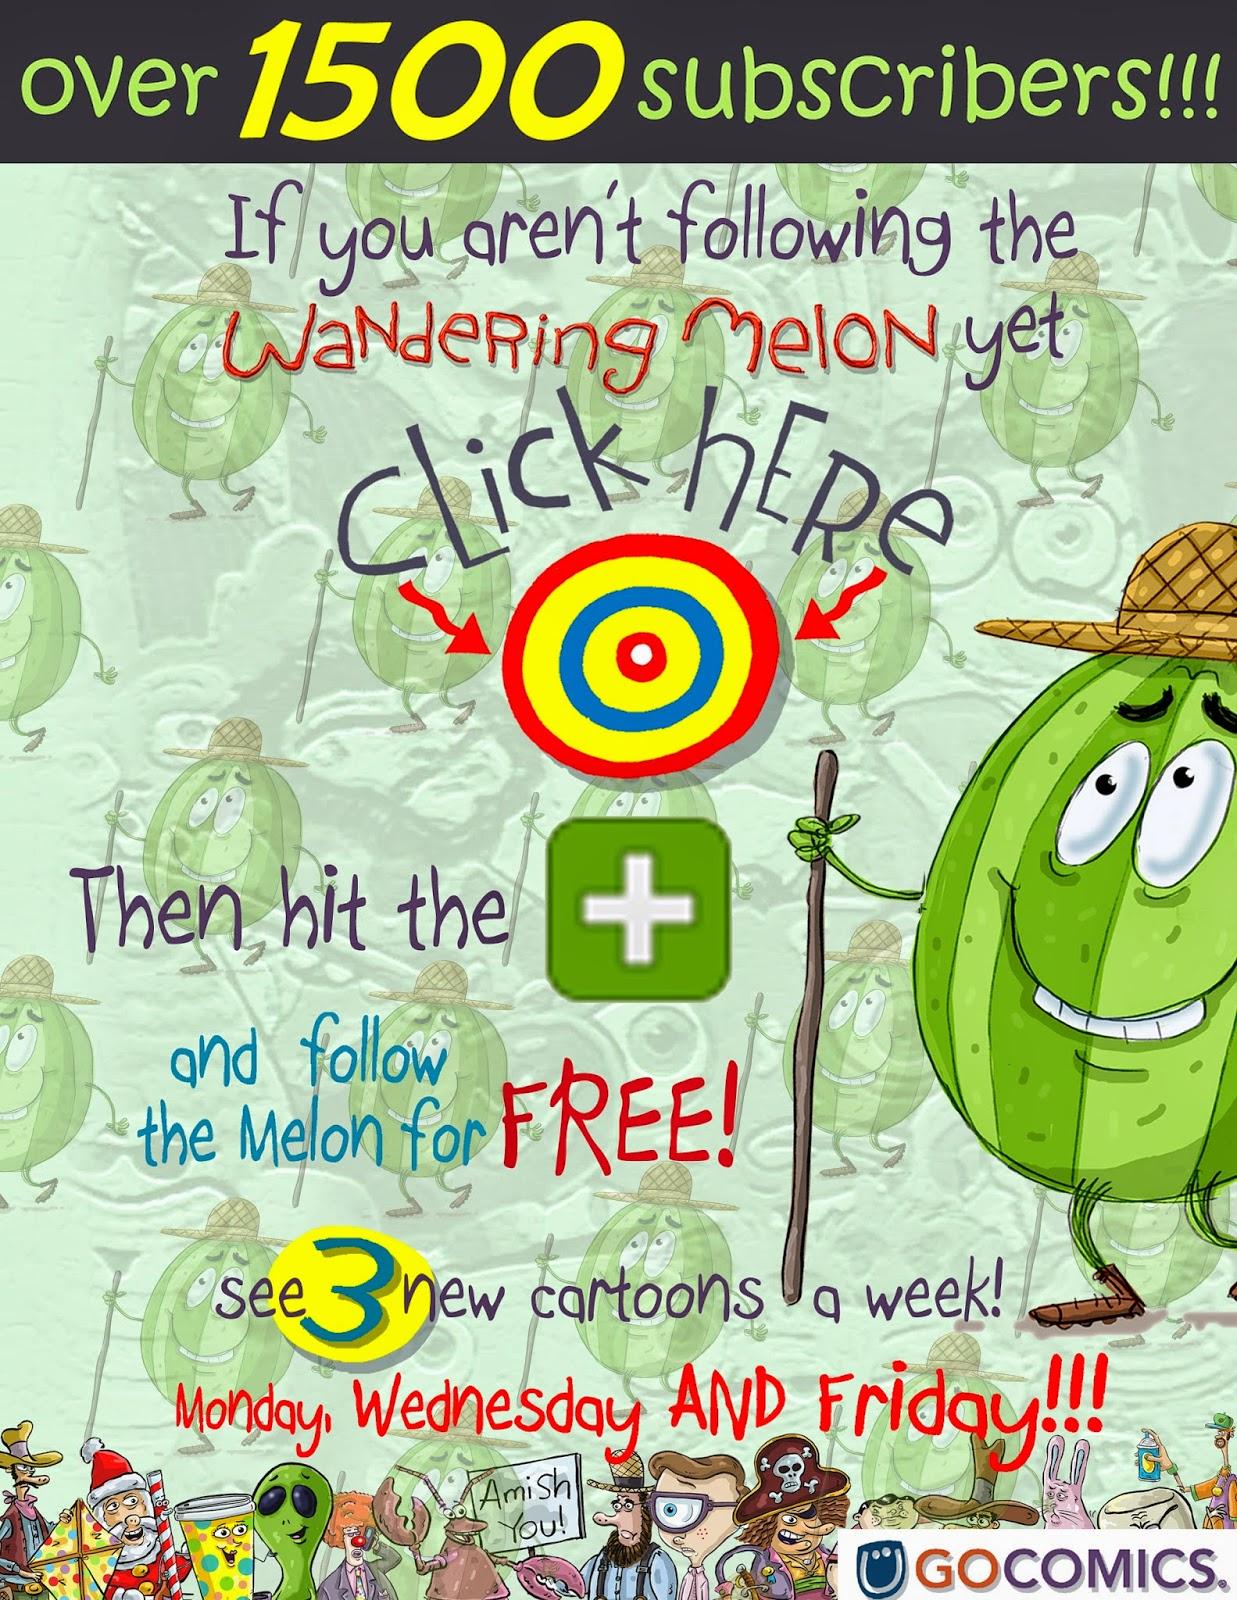 http://www.gocomics.com/the-wandering-melon#.U61xLRBnC8Y